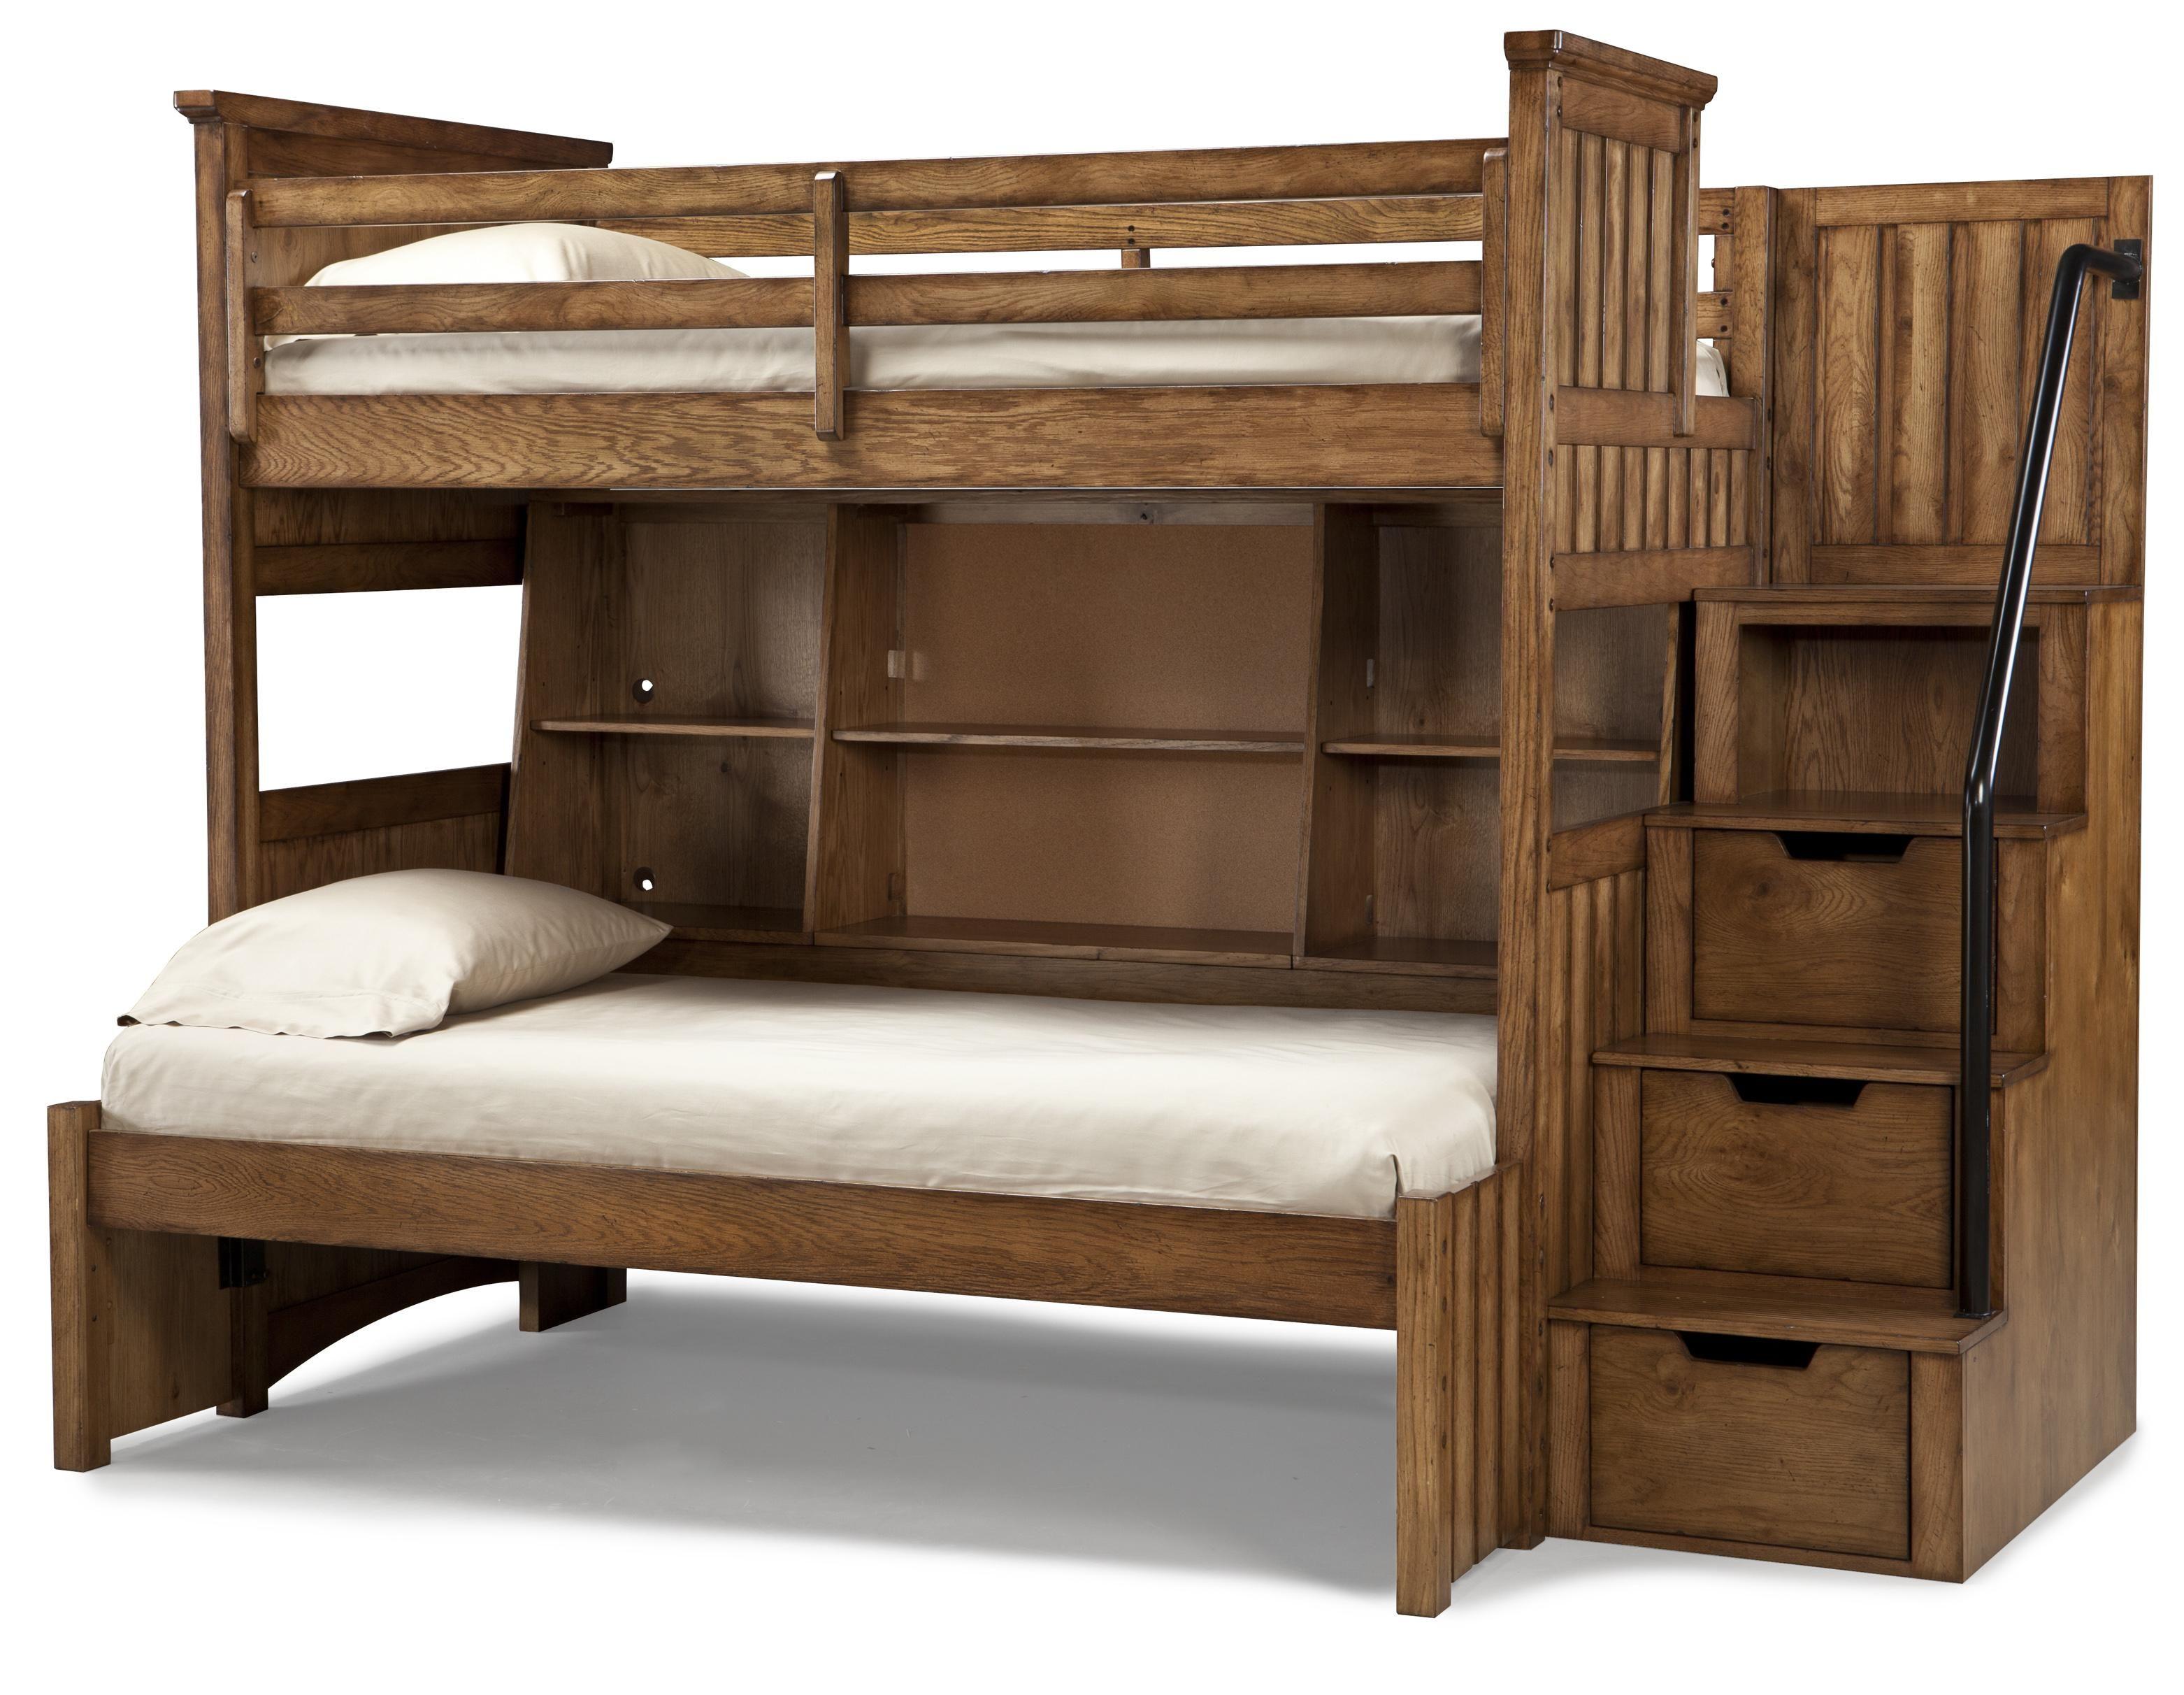 Kids Bedroom Bedroom Decoration Ideas Furnikidz Design